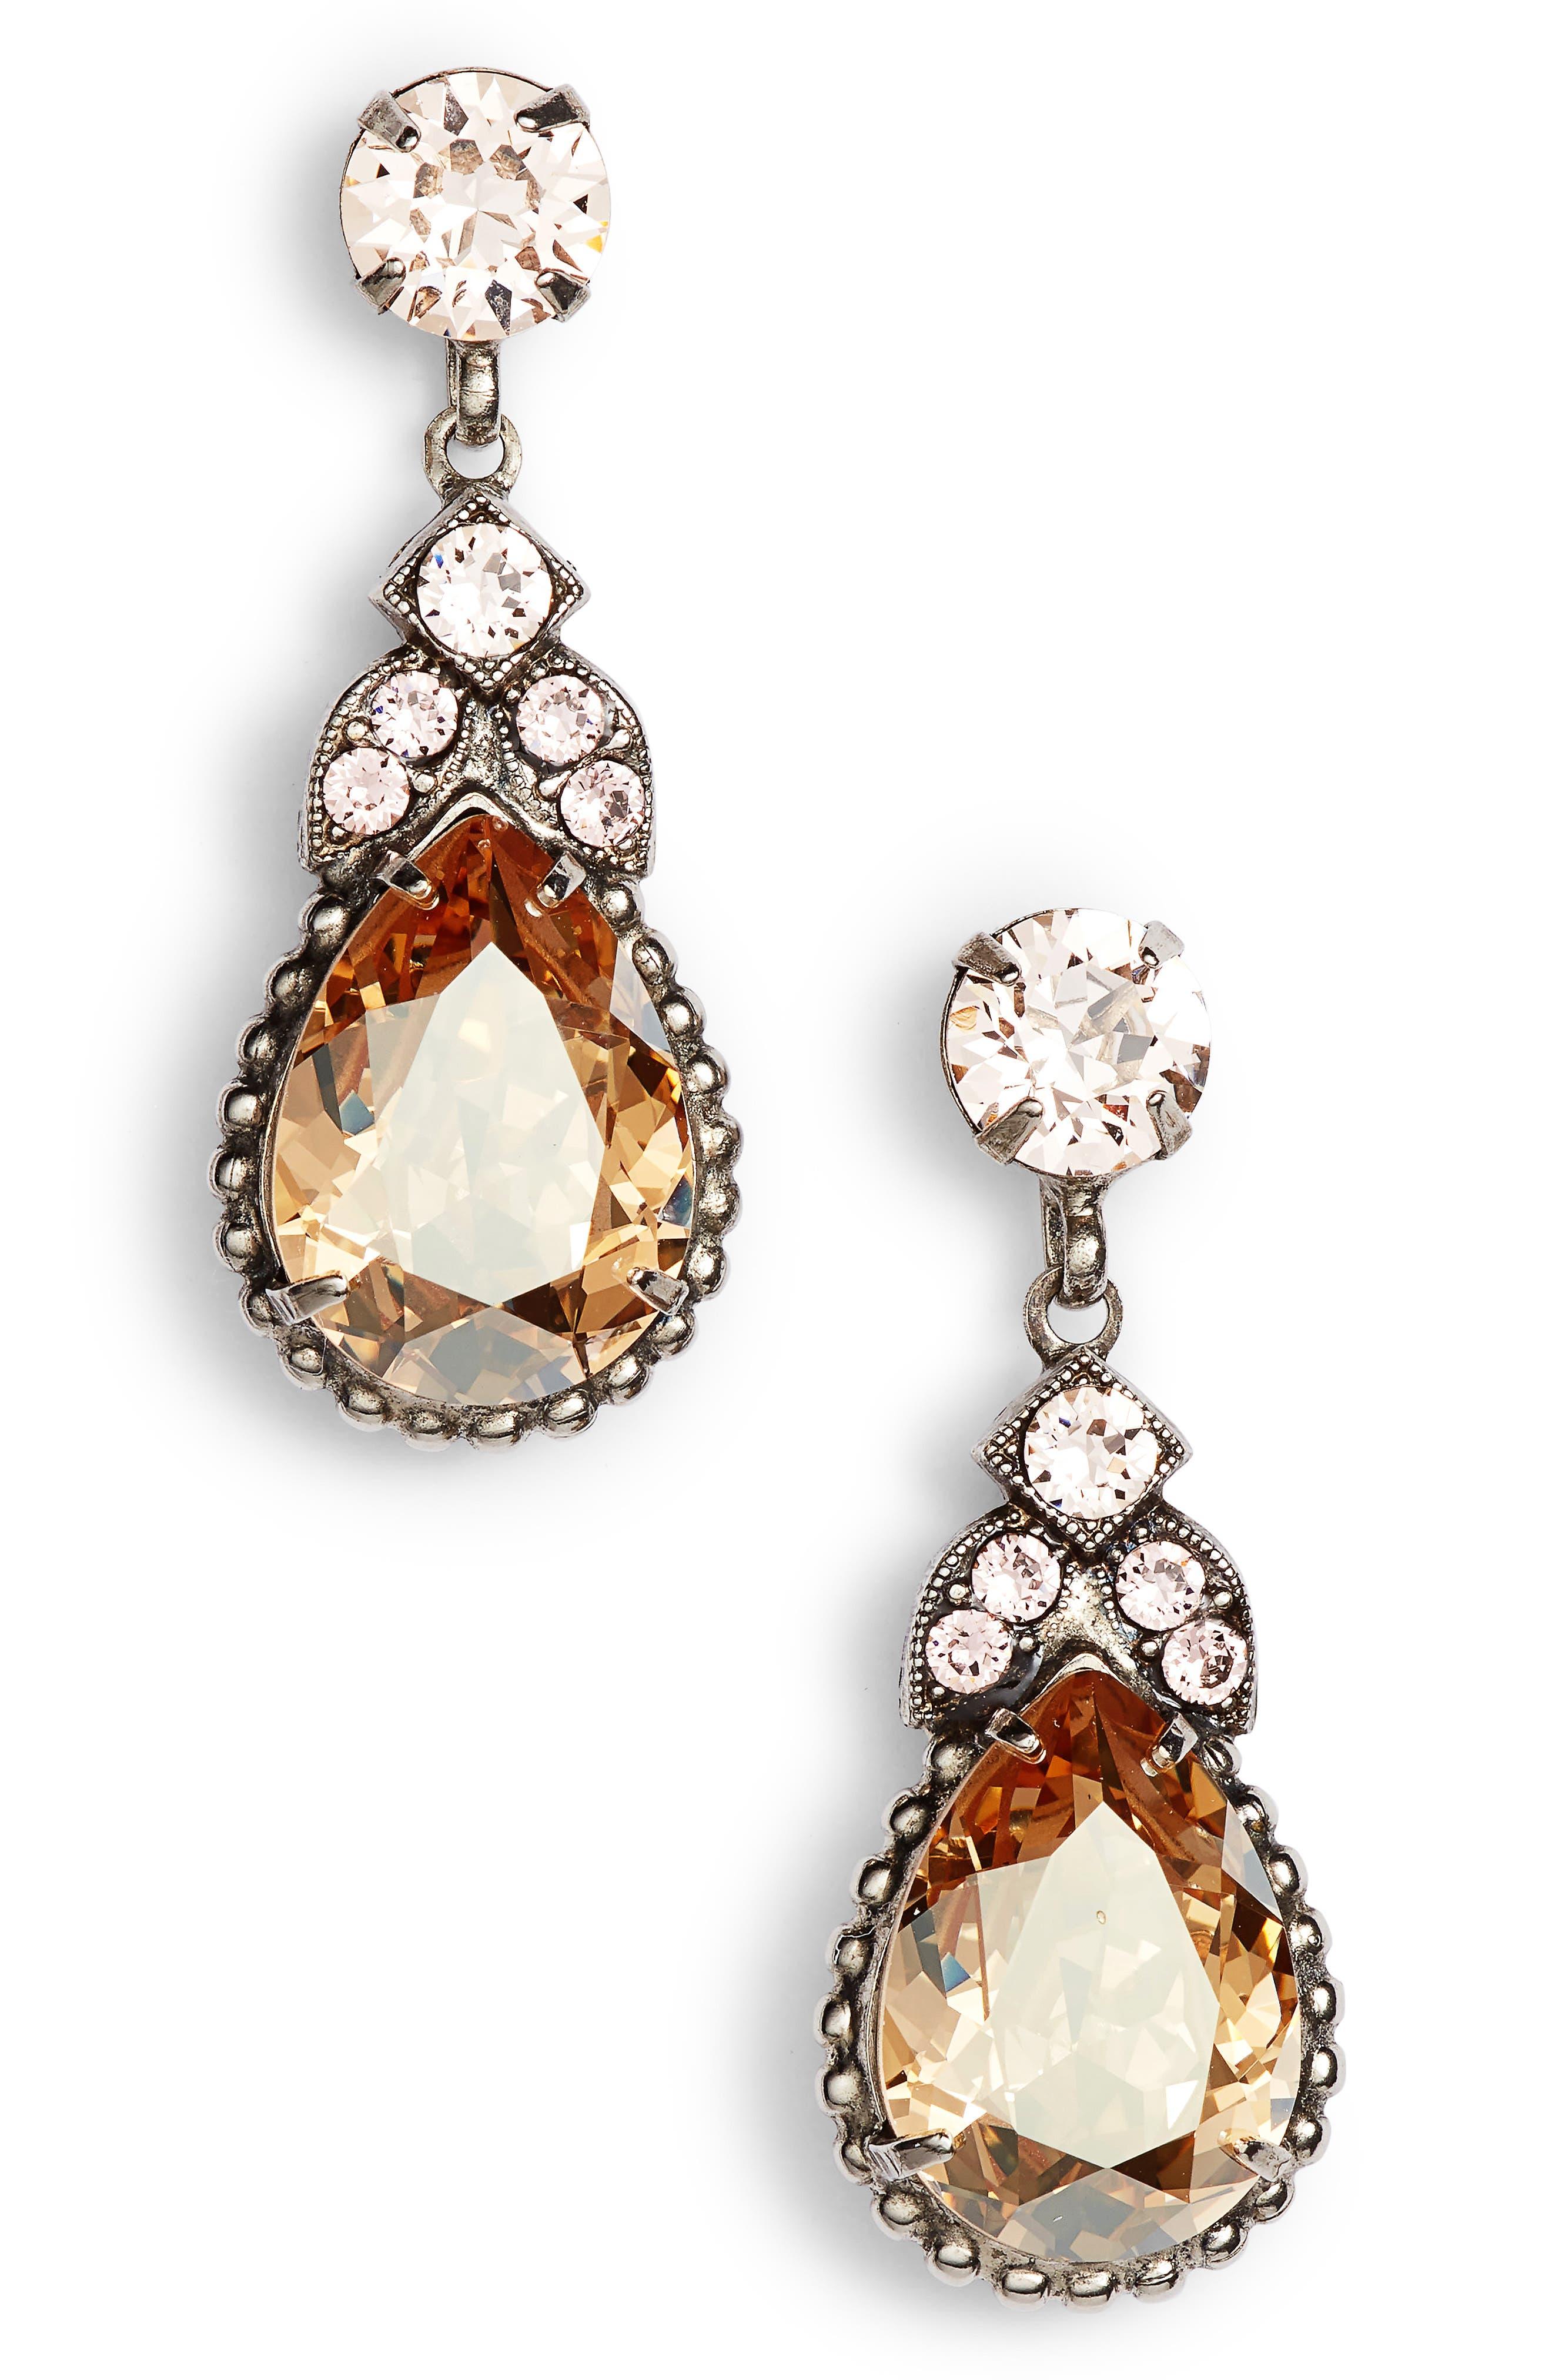 Nigella Crystal Drop Earrings,                             Main thumbnail 1, color,                             PINK